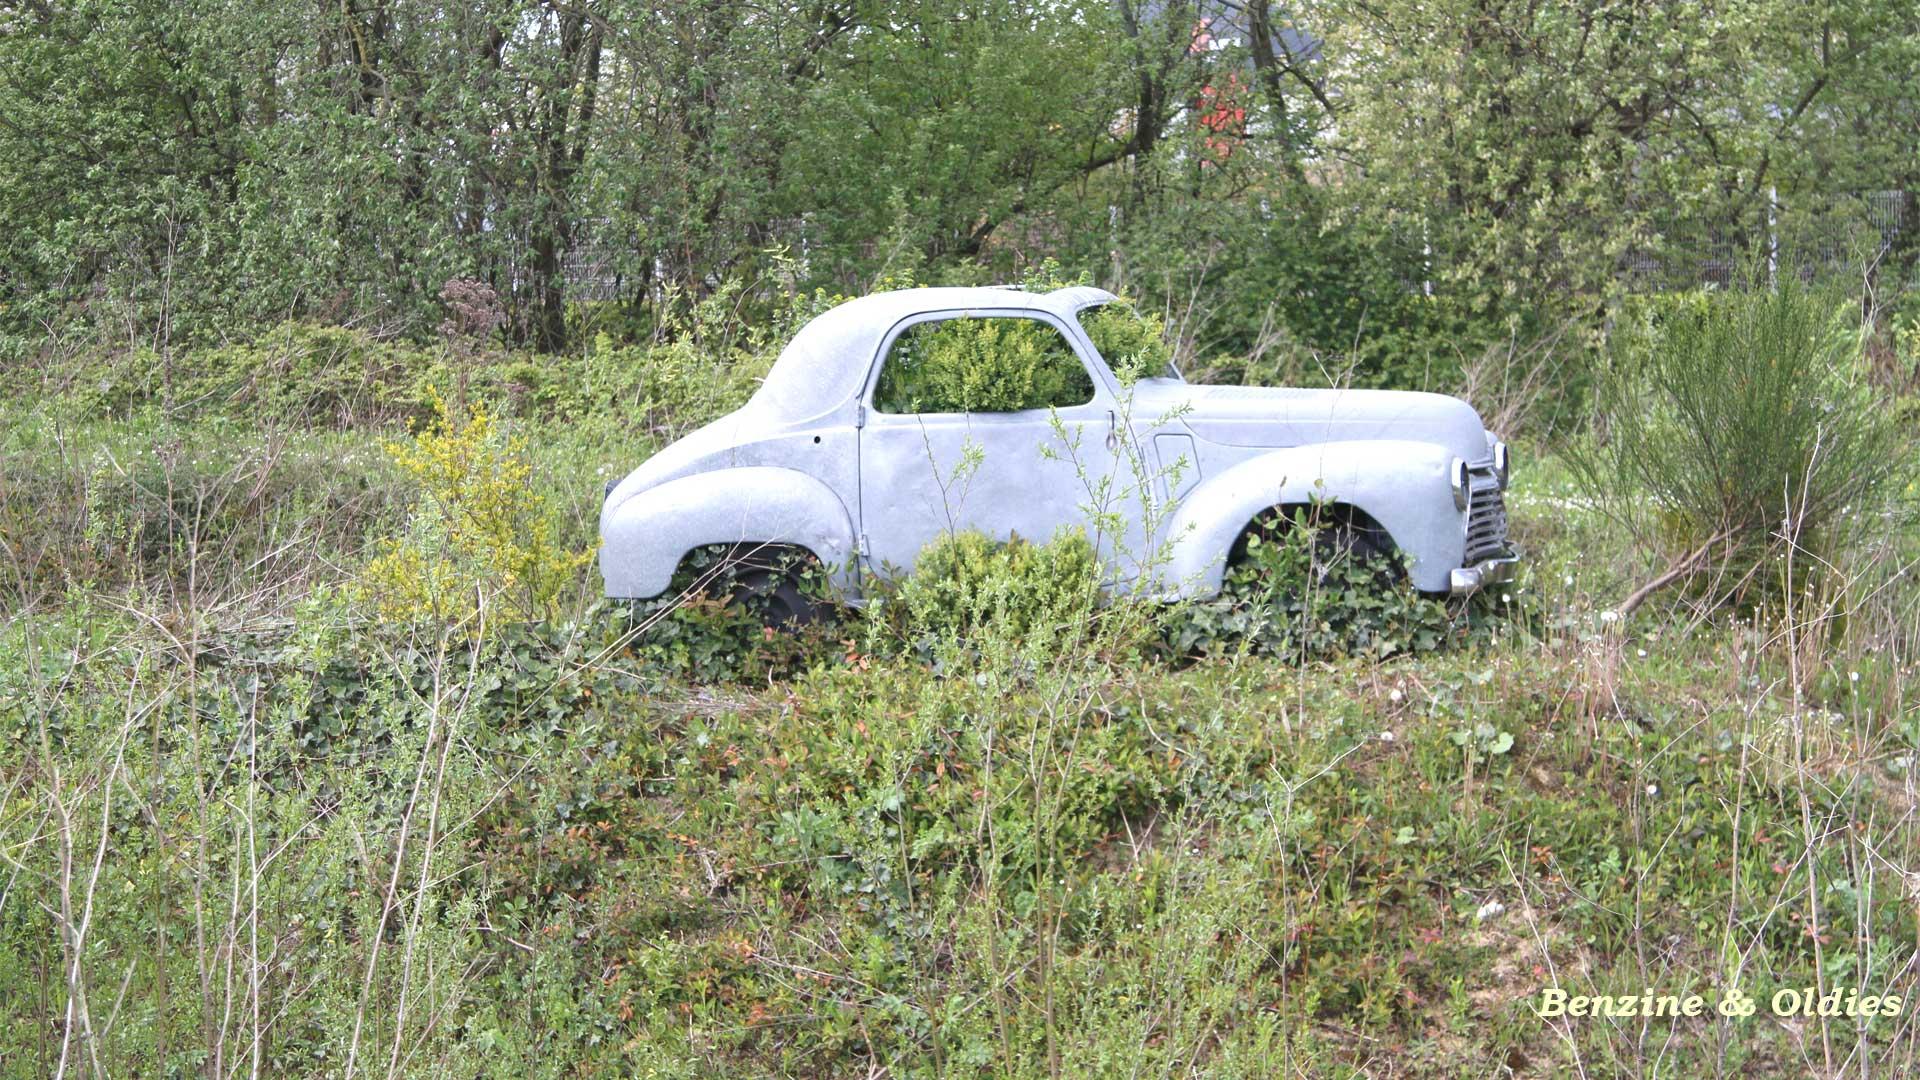 une Simca 6 carrosserie aluminium oubliée dans la nature - Simca6 801946simca6street02w19201080